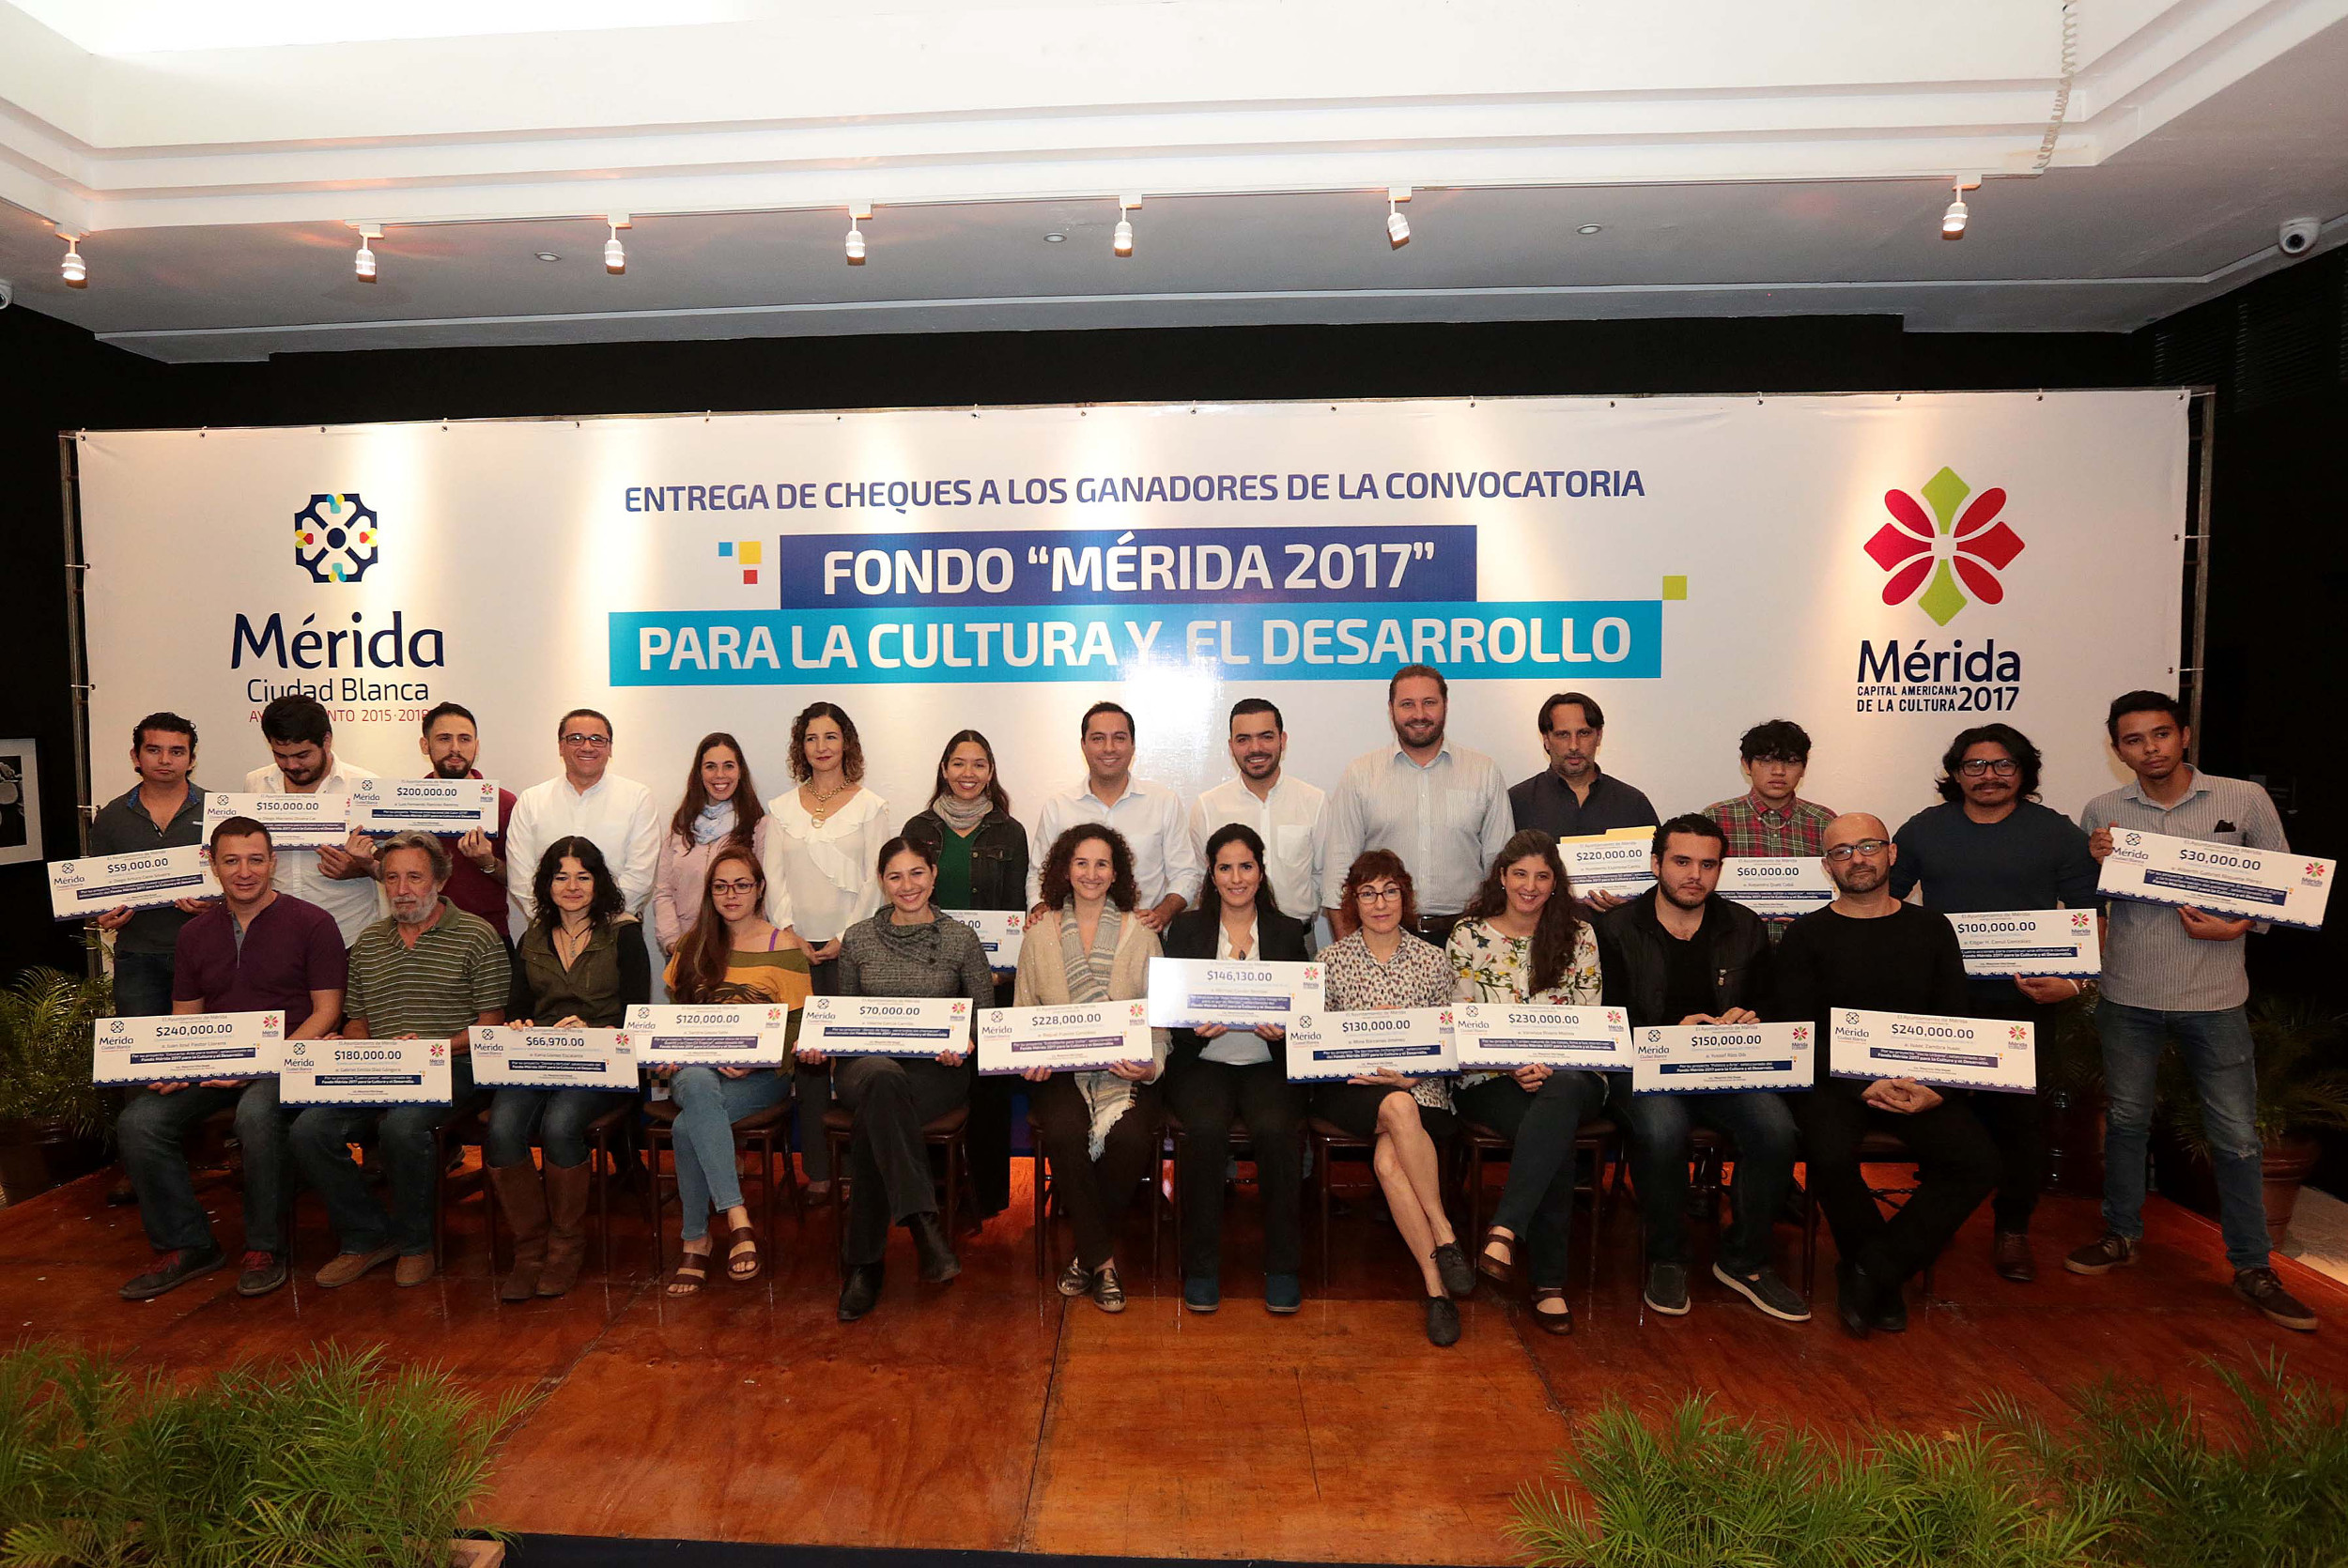 Entregan cheques a ganadores de convocatoria Fondo Mérida 2017 para Cultura